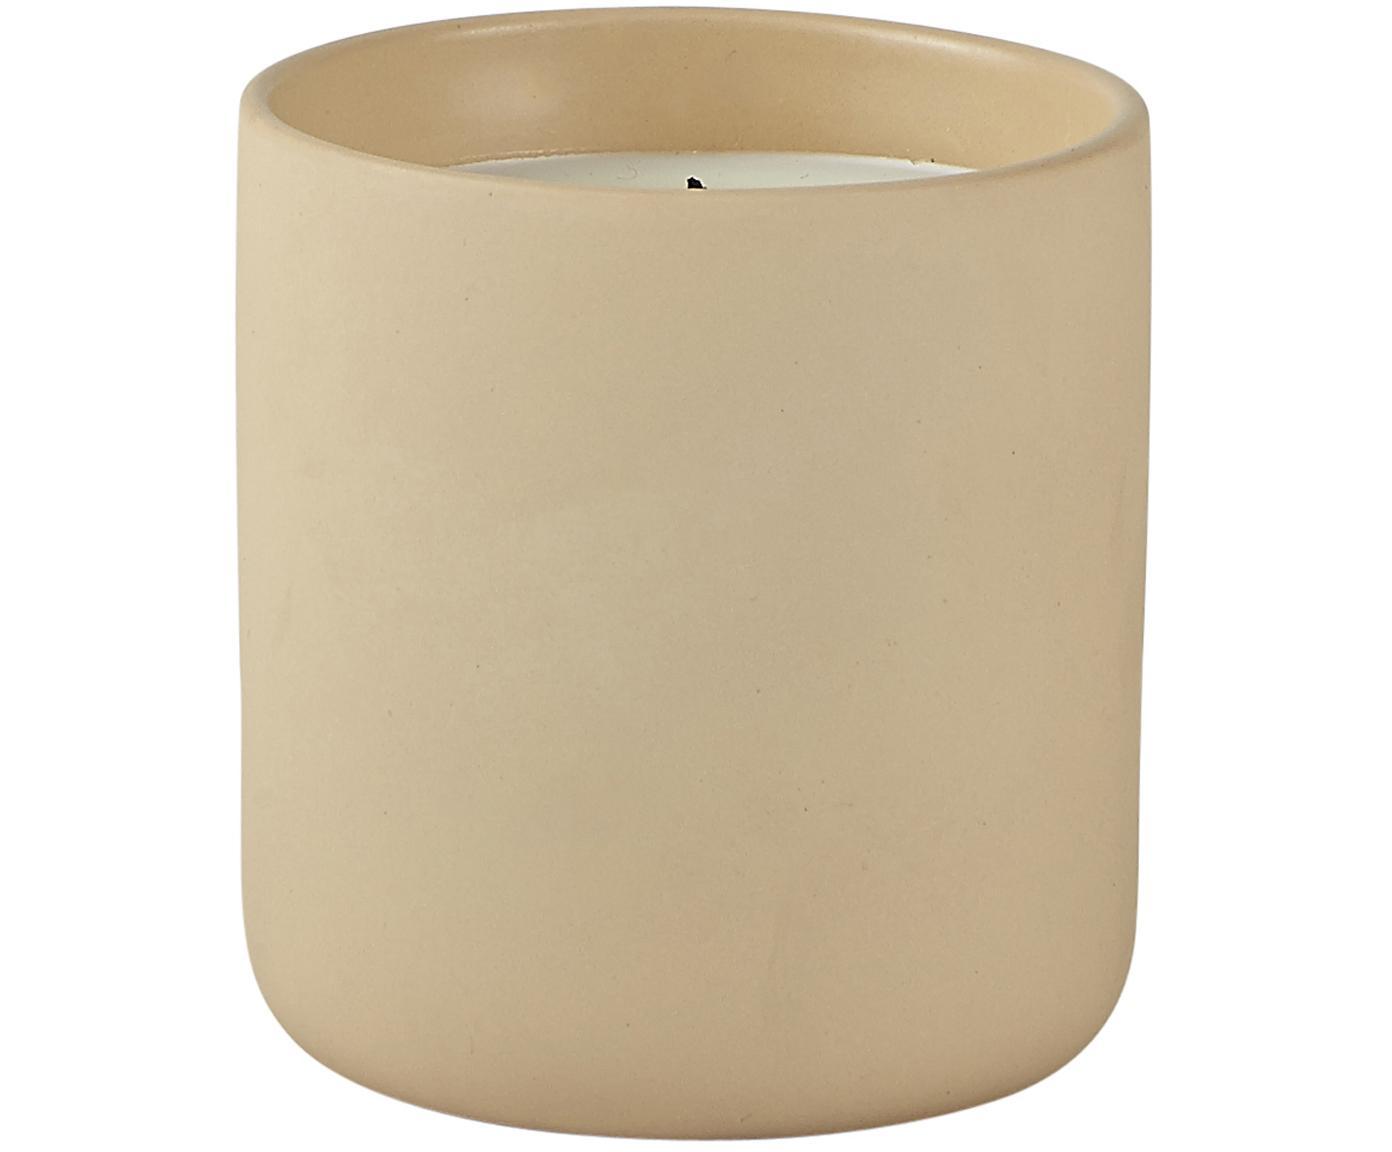 Duftkerze Water of Life, Behälter: Keramik, Sandfarben, Ø 8 x H 10 cm